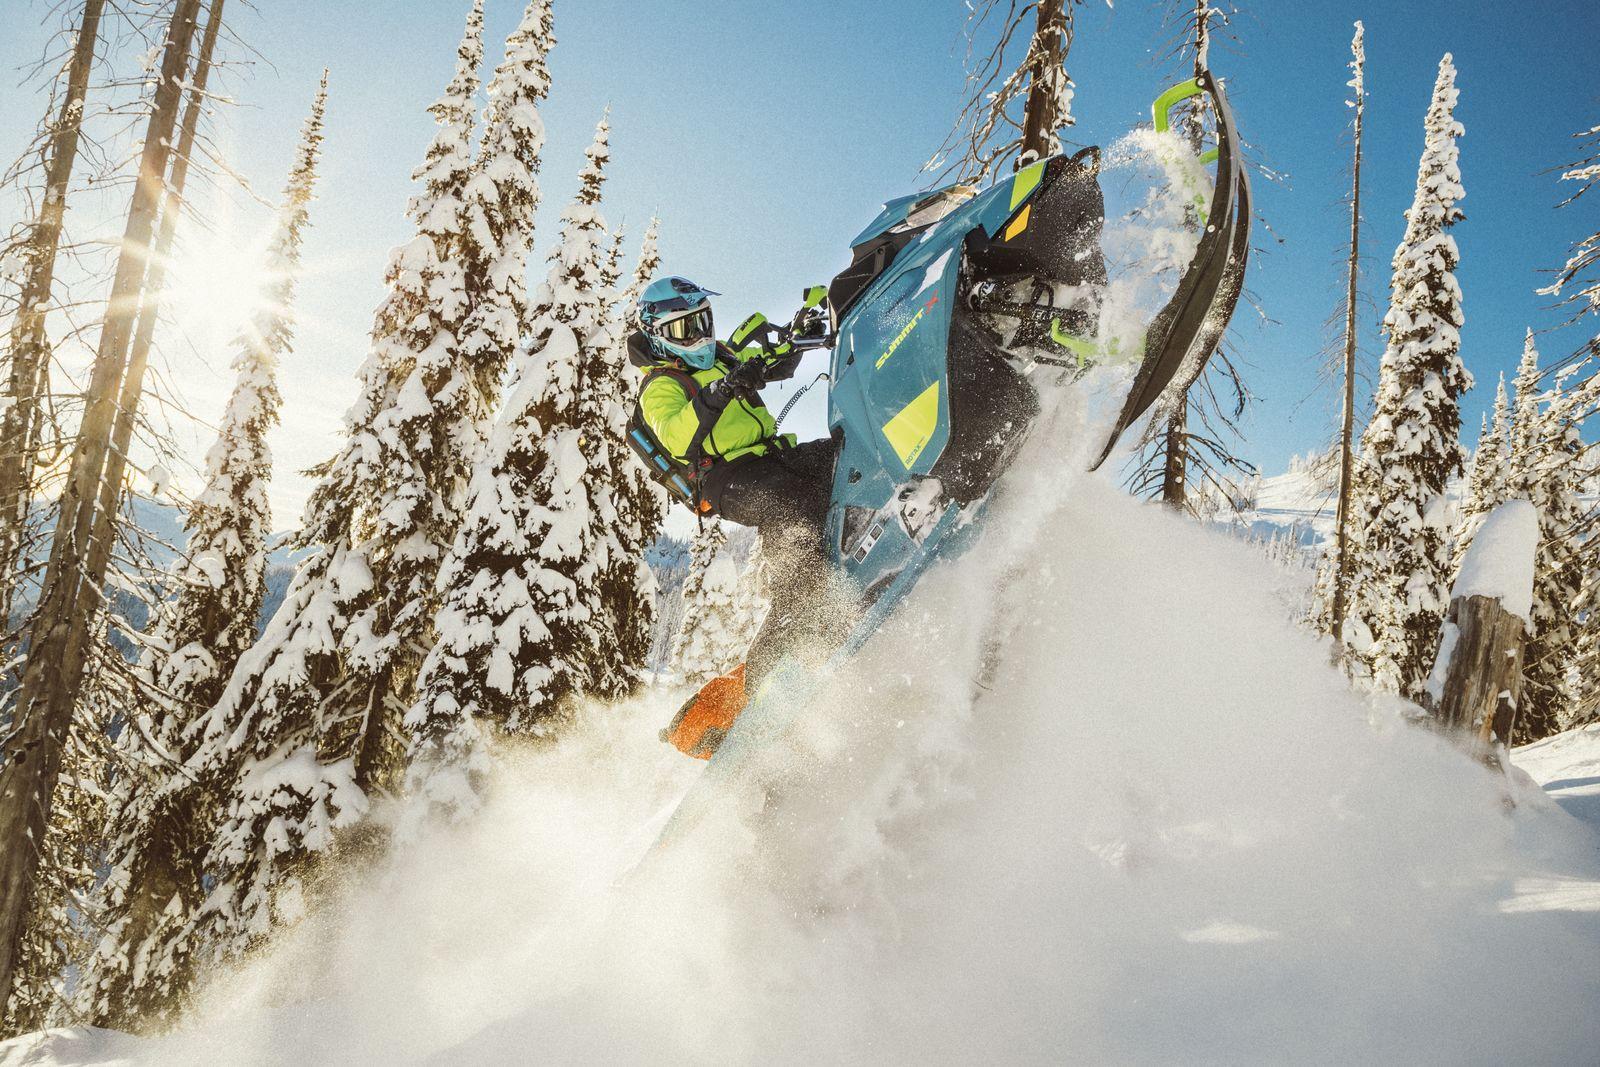 Ski doo 2020_Summit_PAC_Action_MY20_JW_14467_R3_RGB-1600x1600.jpg